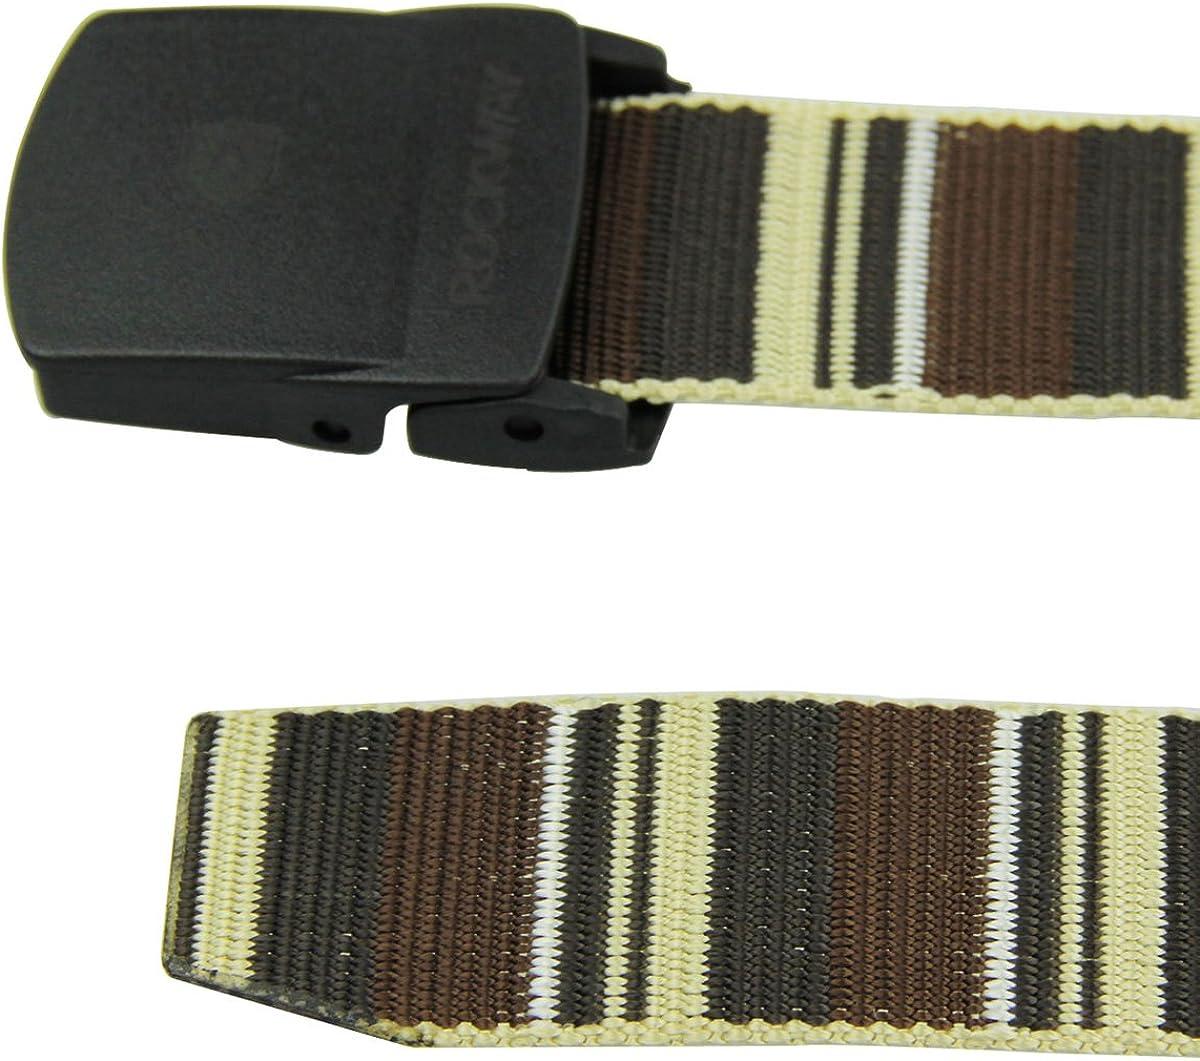 RockWay Unisex Nylon Belts Colorful Modern Striped Nylon Belt with Hypoallergenic Buckle Coffee Travel Belt